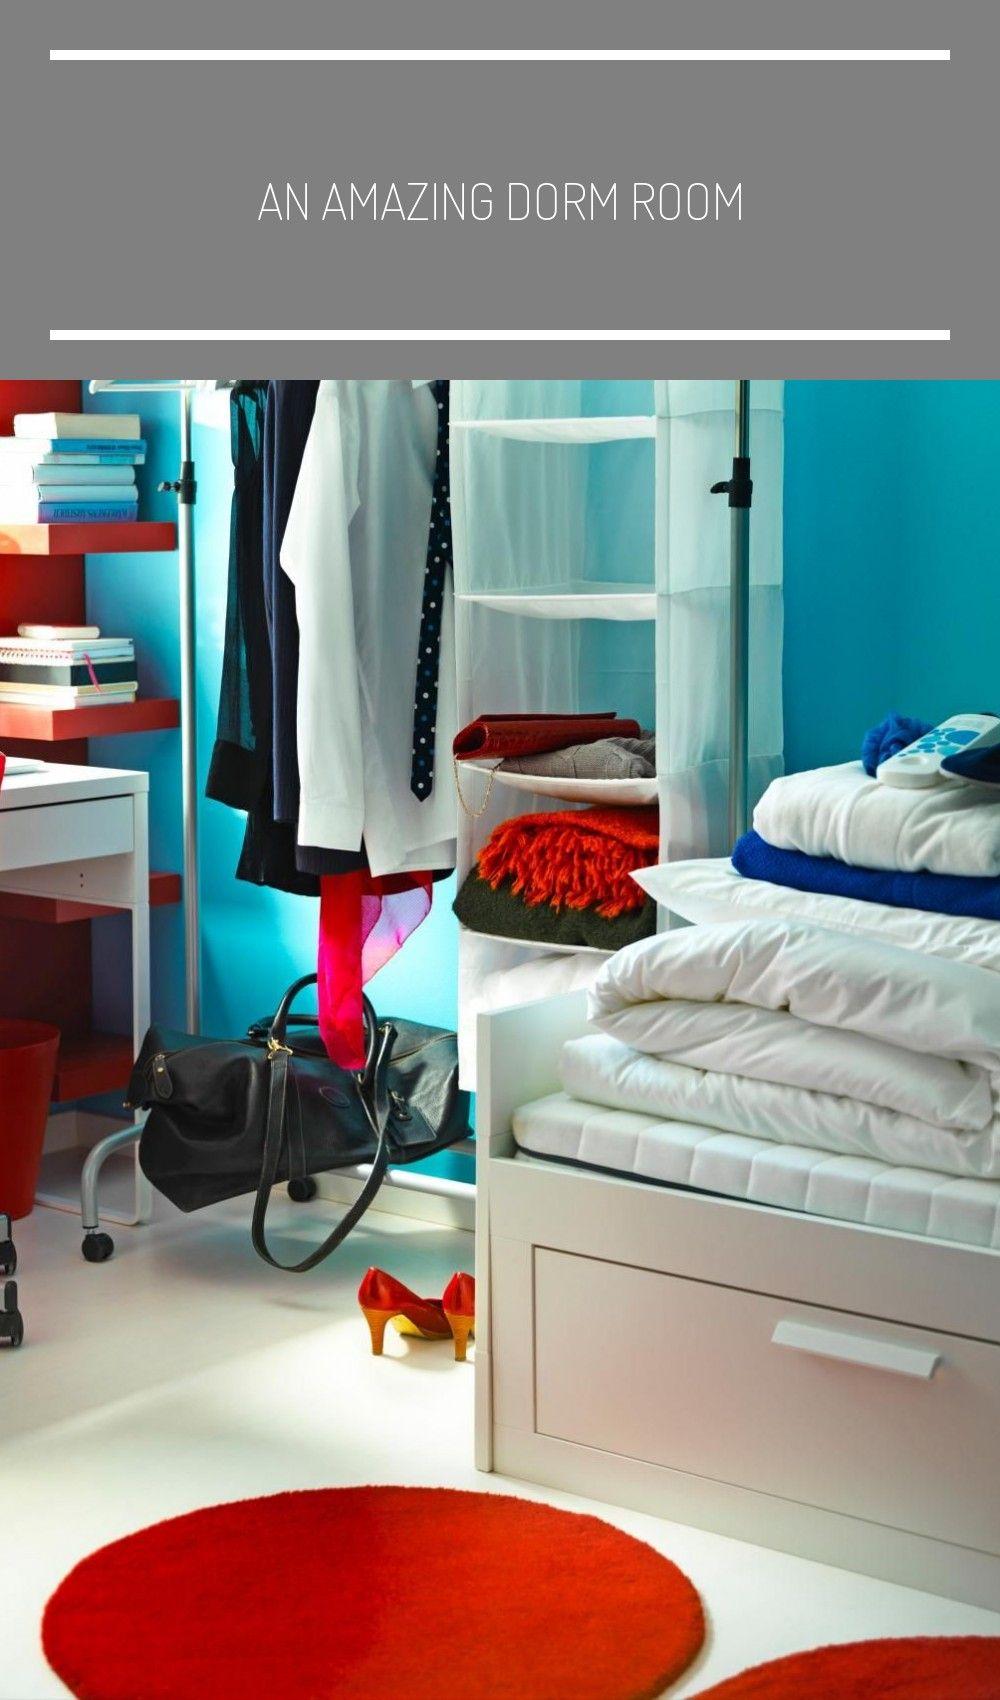 Ikea Dorm Room Ideas: Dorm Room Shelves